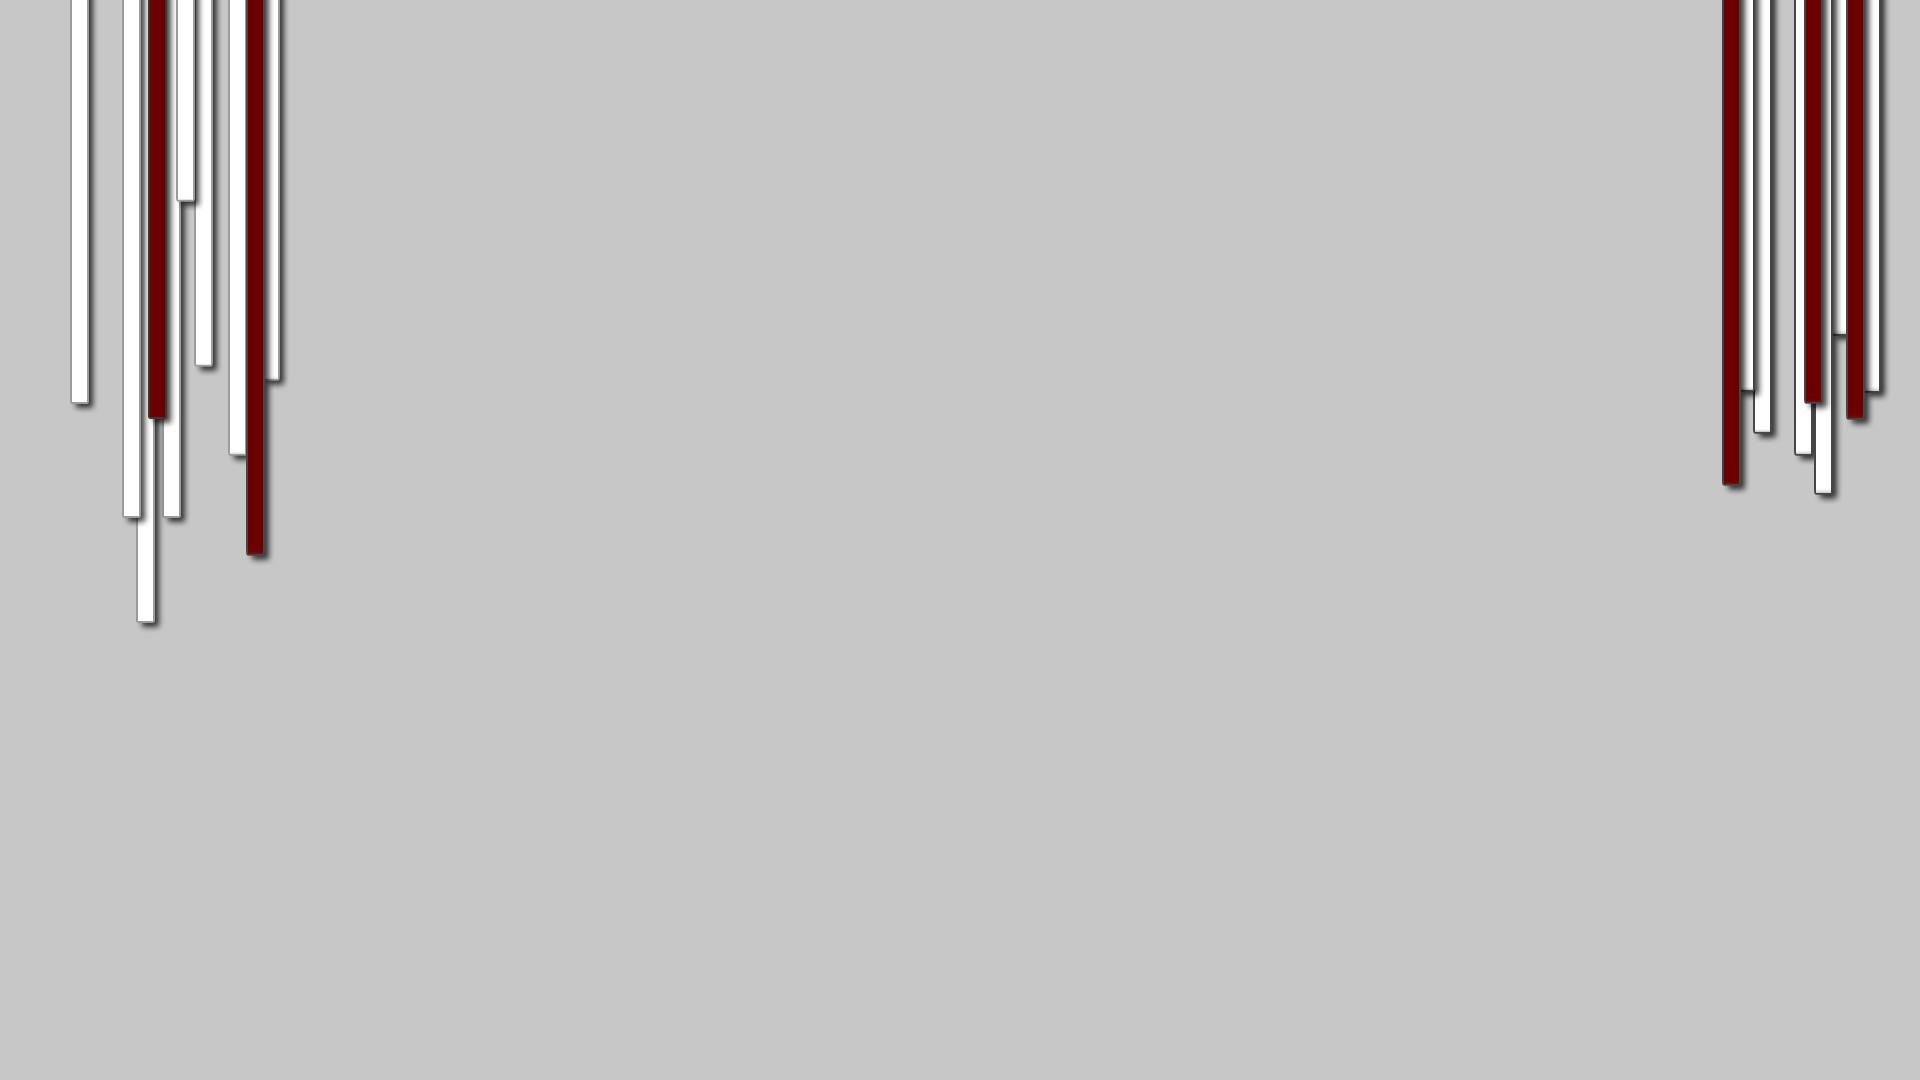 White Background Tumblr  U00b7 U2460 Download Free Cool Hd